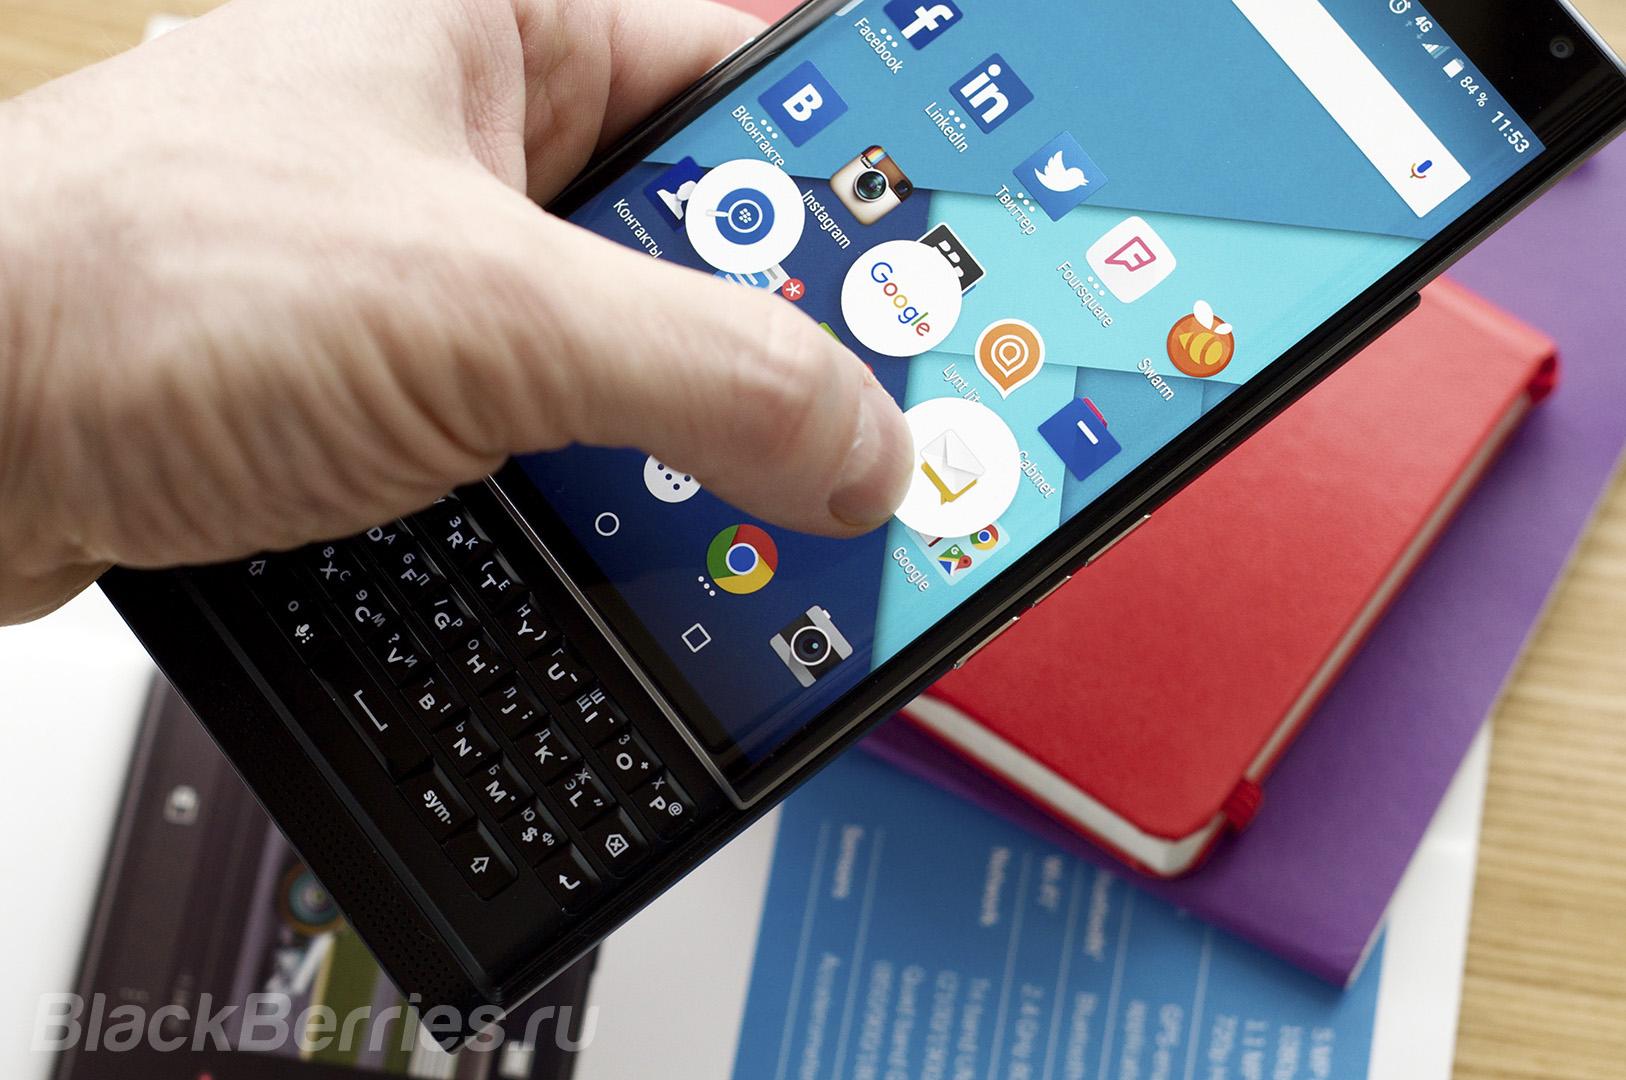 BlackBerry-Priv-Review-063